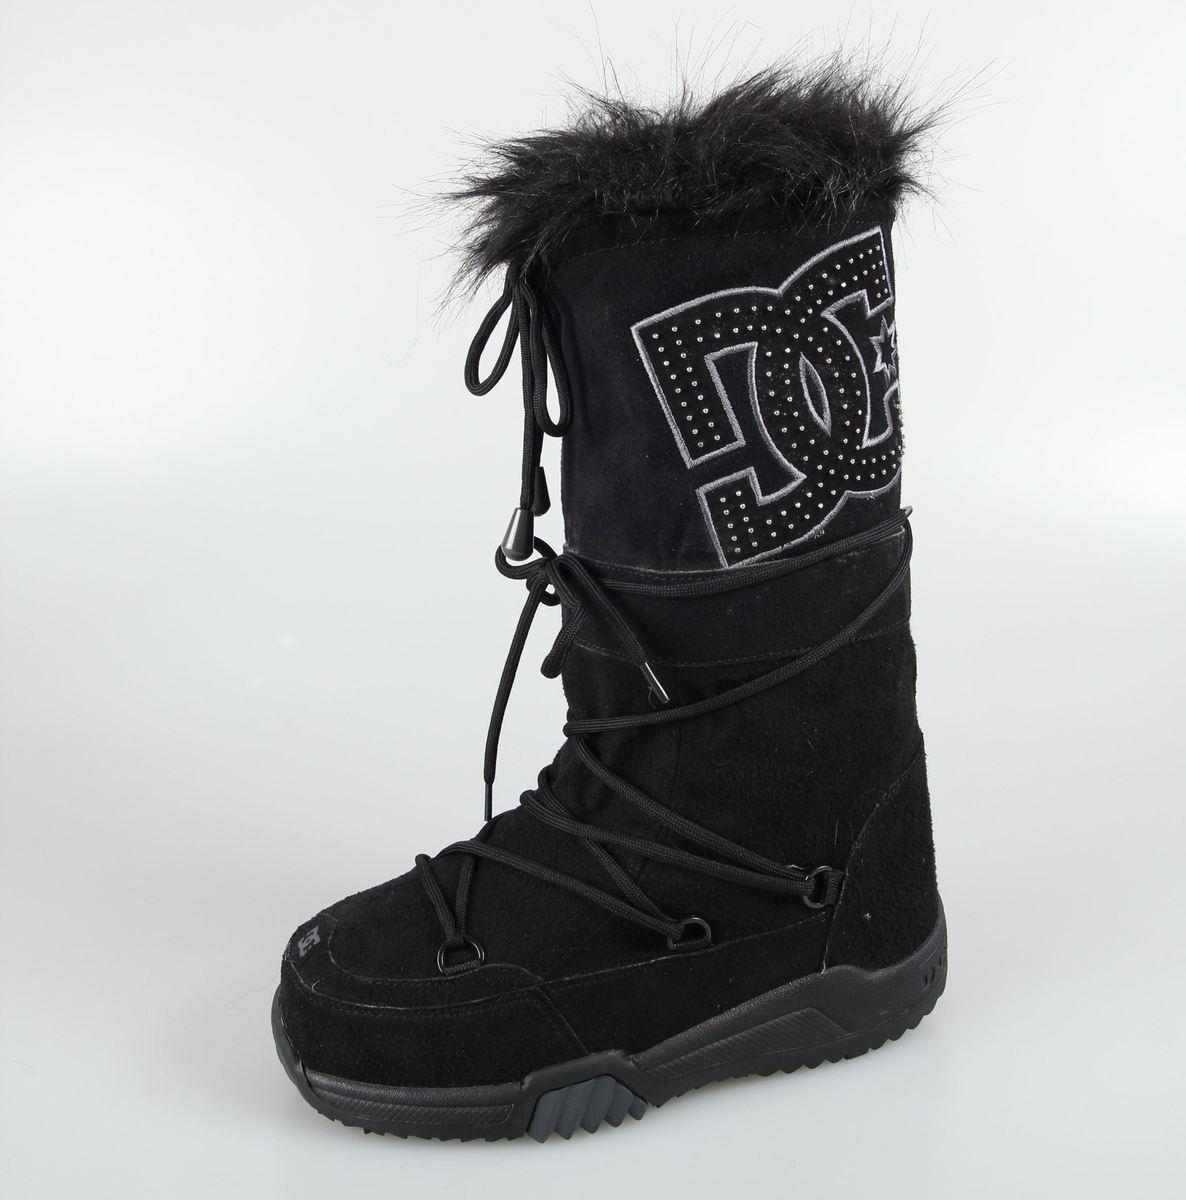 boty dámské zimní DC - Chalet Suede - BLACK-DK SHADOW-BDH